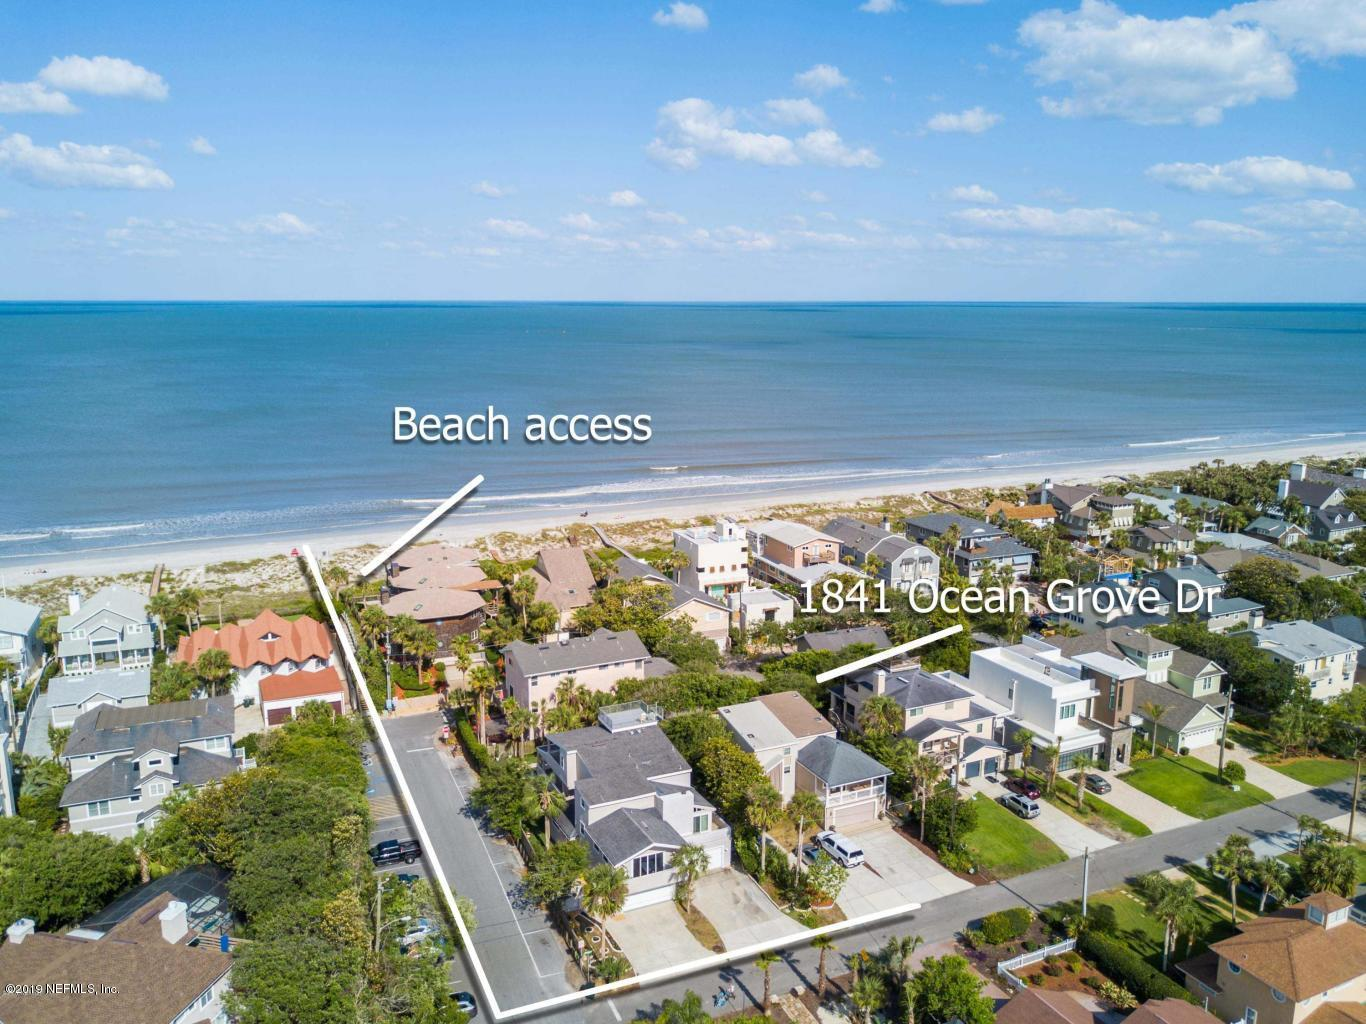 1841 OCEAN GROVE, ATLANTIC BEACH, FLORIDA 32233, 4 Bedrooms Bedrooms, ,3 BathroomsBathrooms,Residential - single family,For sale,OCEAN GROVE,1002605